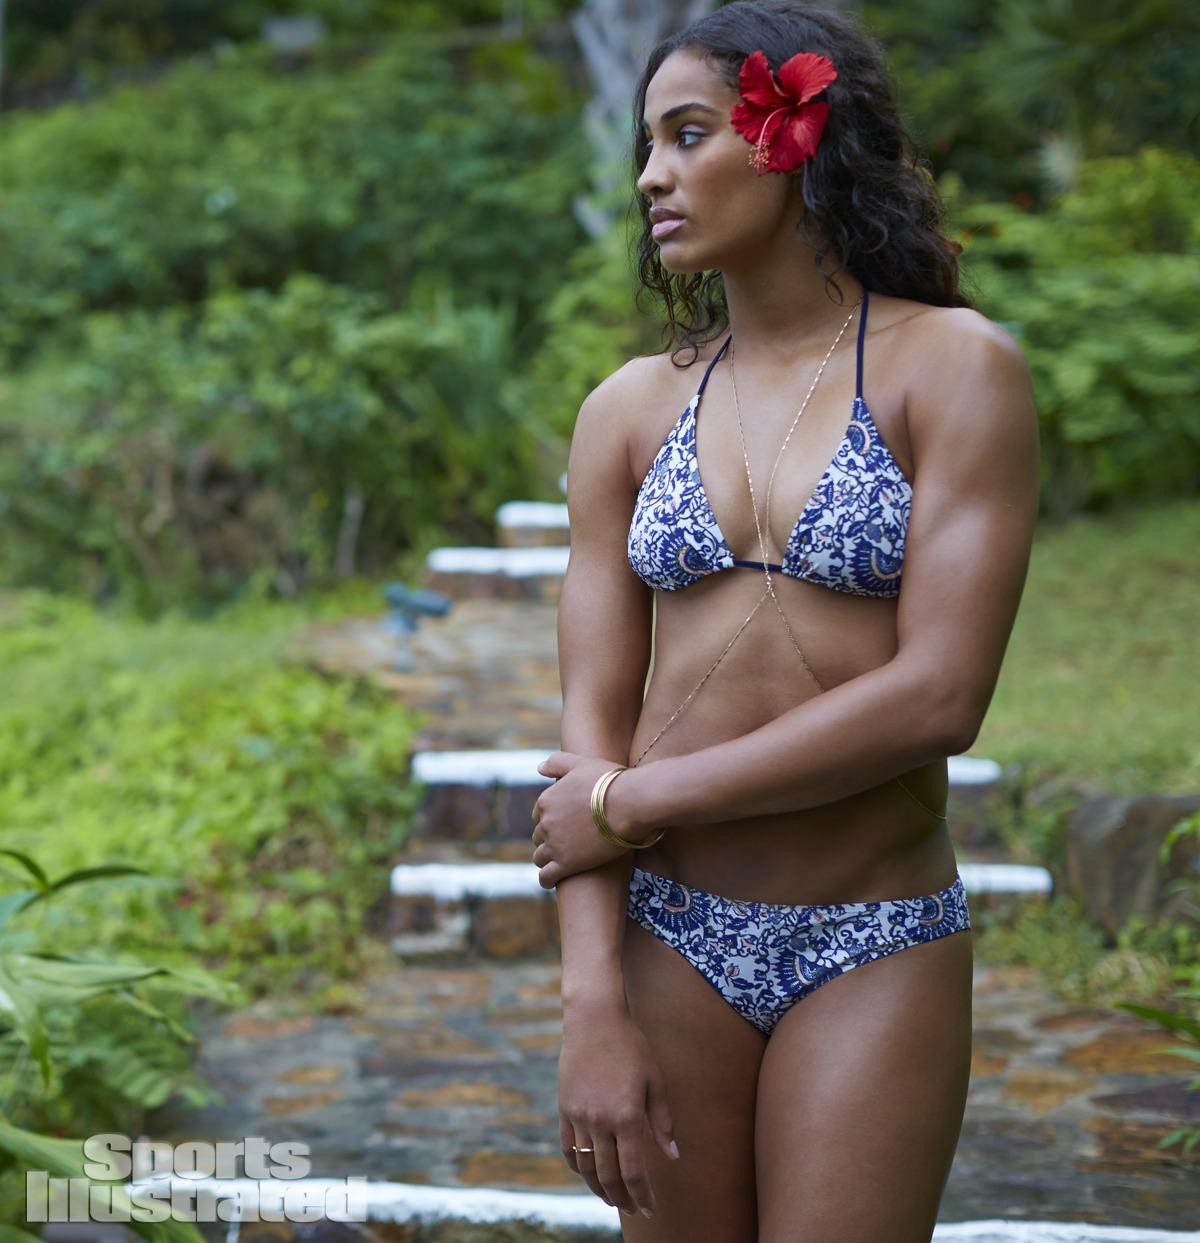 Skylar Diggins in a bikini